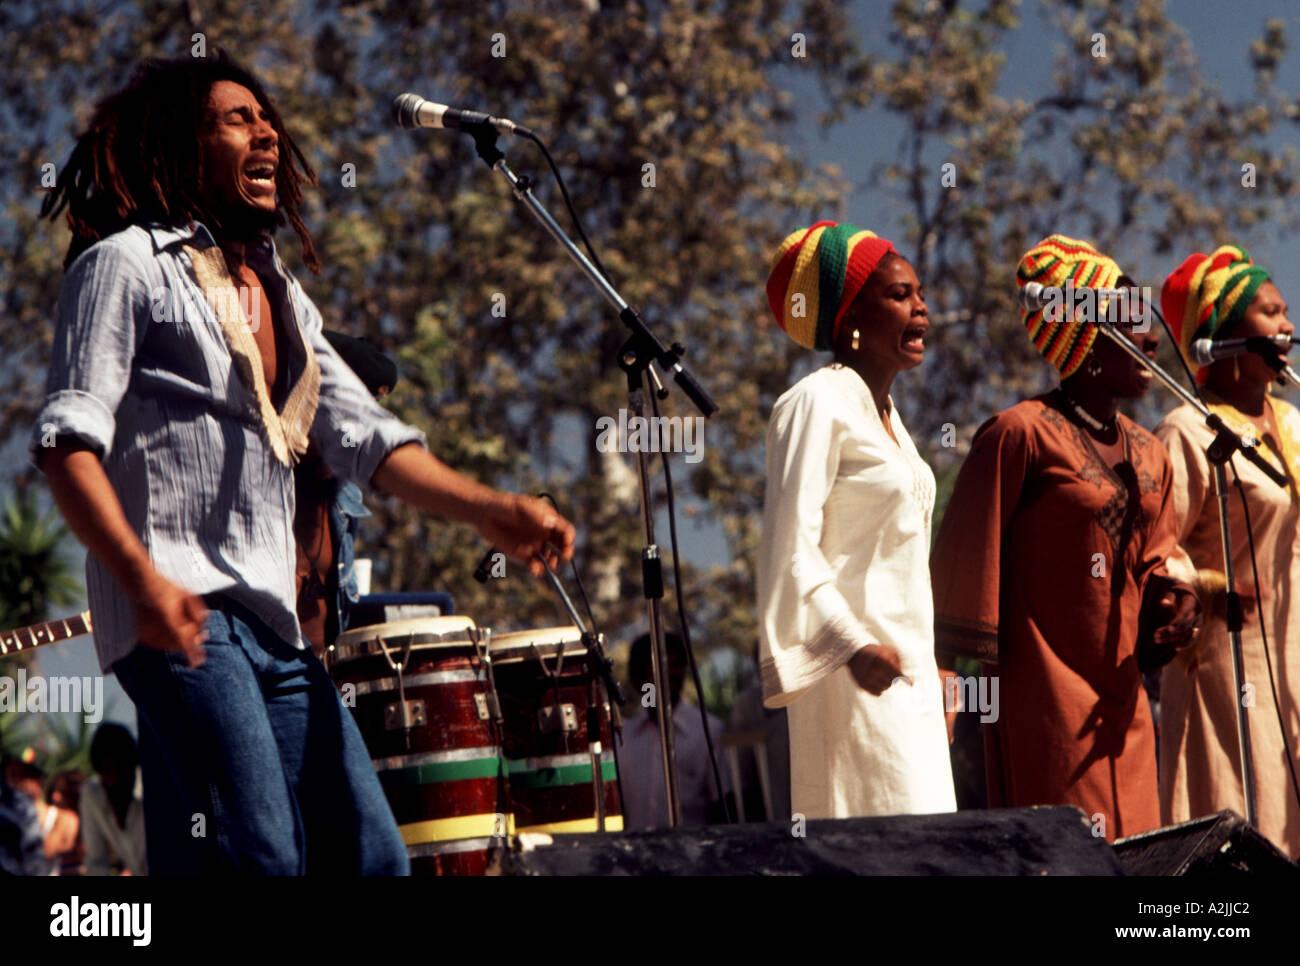 BOB MARLEY AND THE WAILERS Jamaican reggae musician with The Wailers - Stock Image